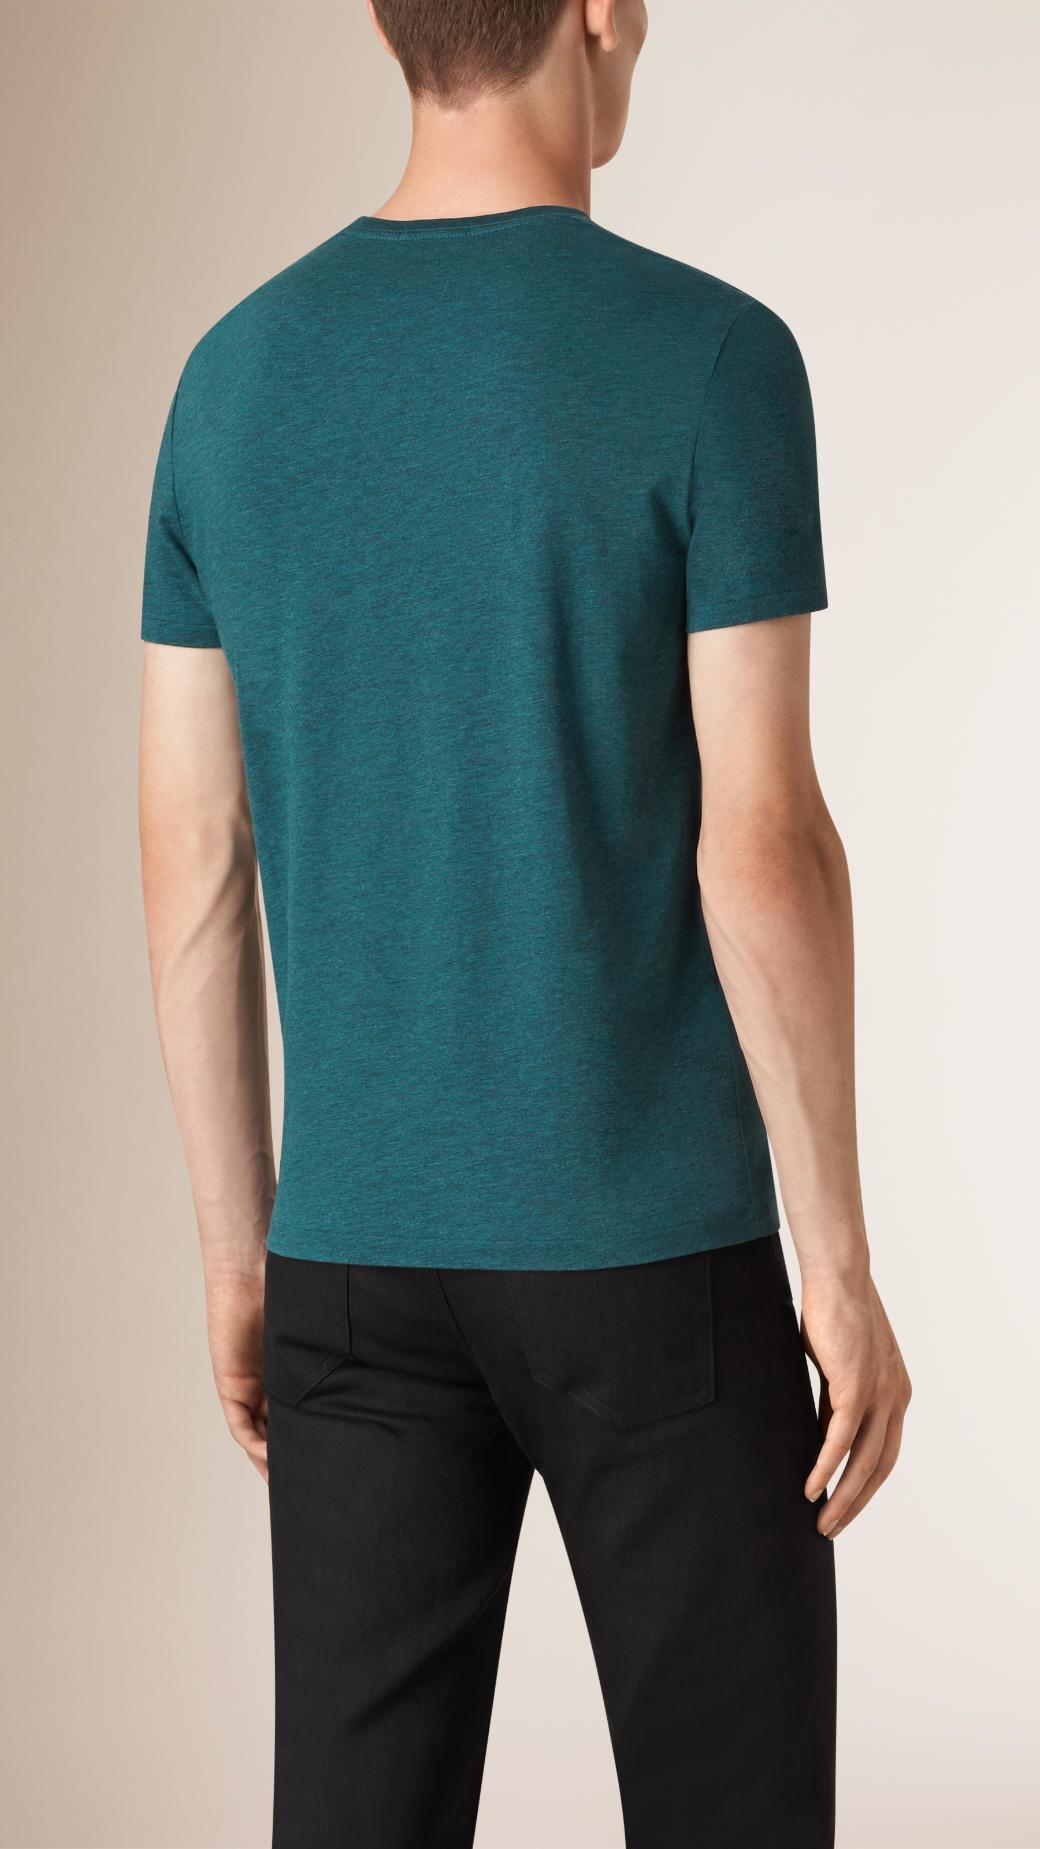 Burberry liquid soft cotton t shirt dark teal melange in for Soft cotton dress shirts